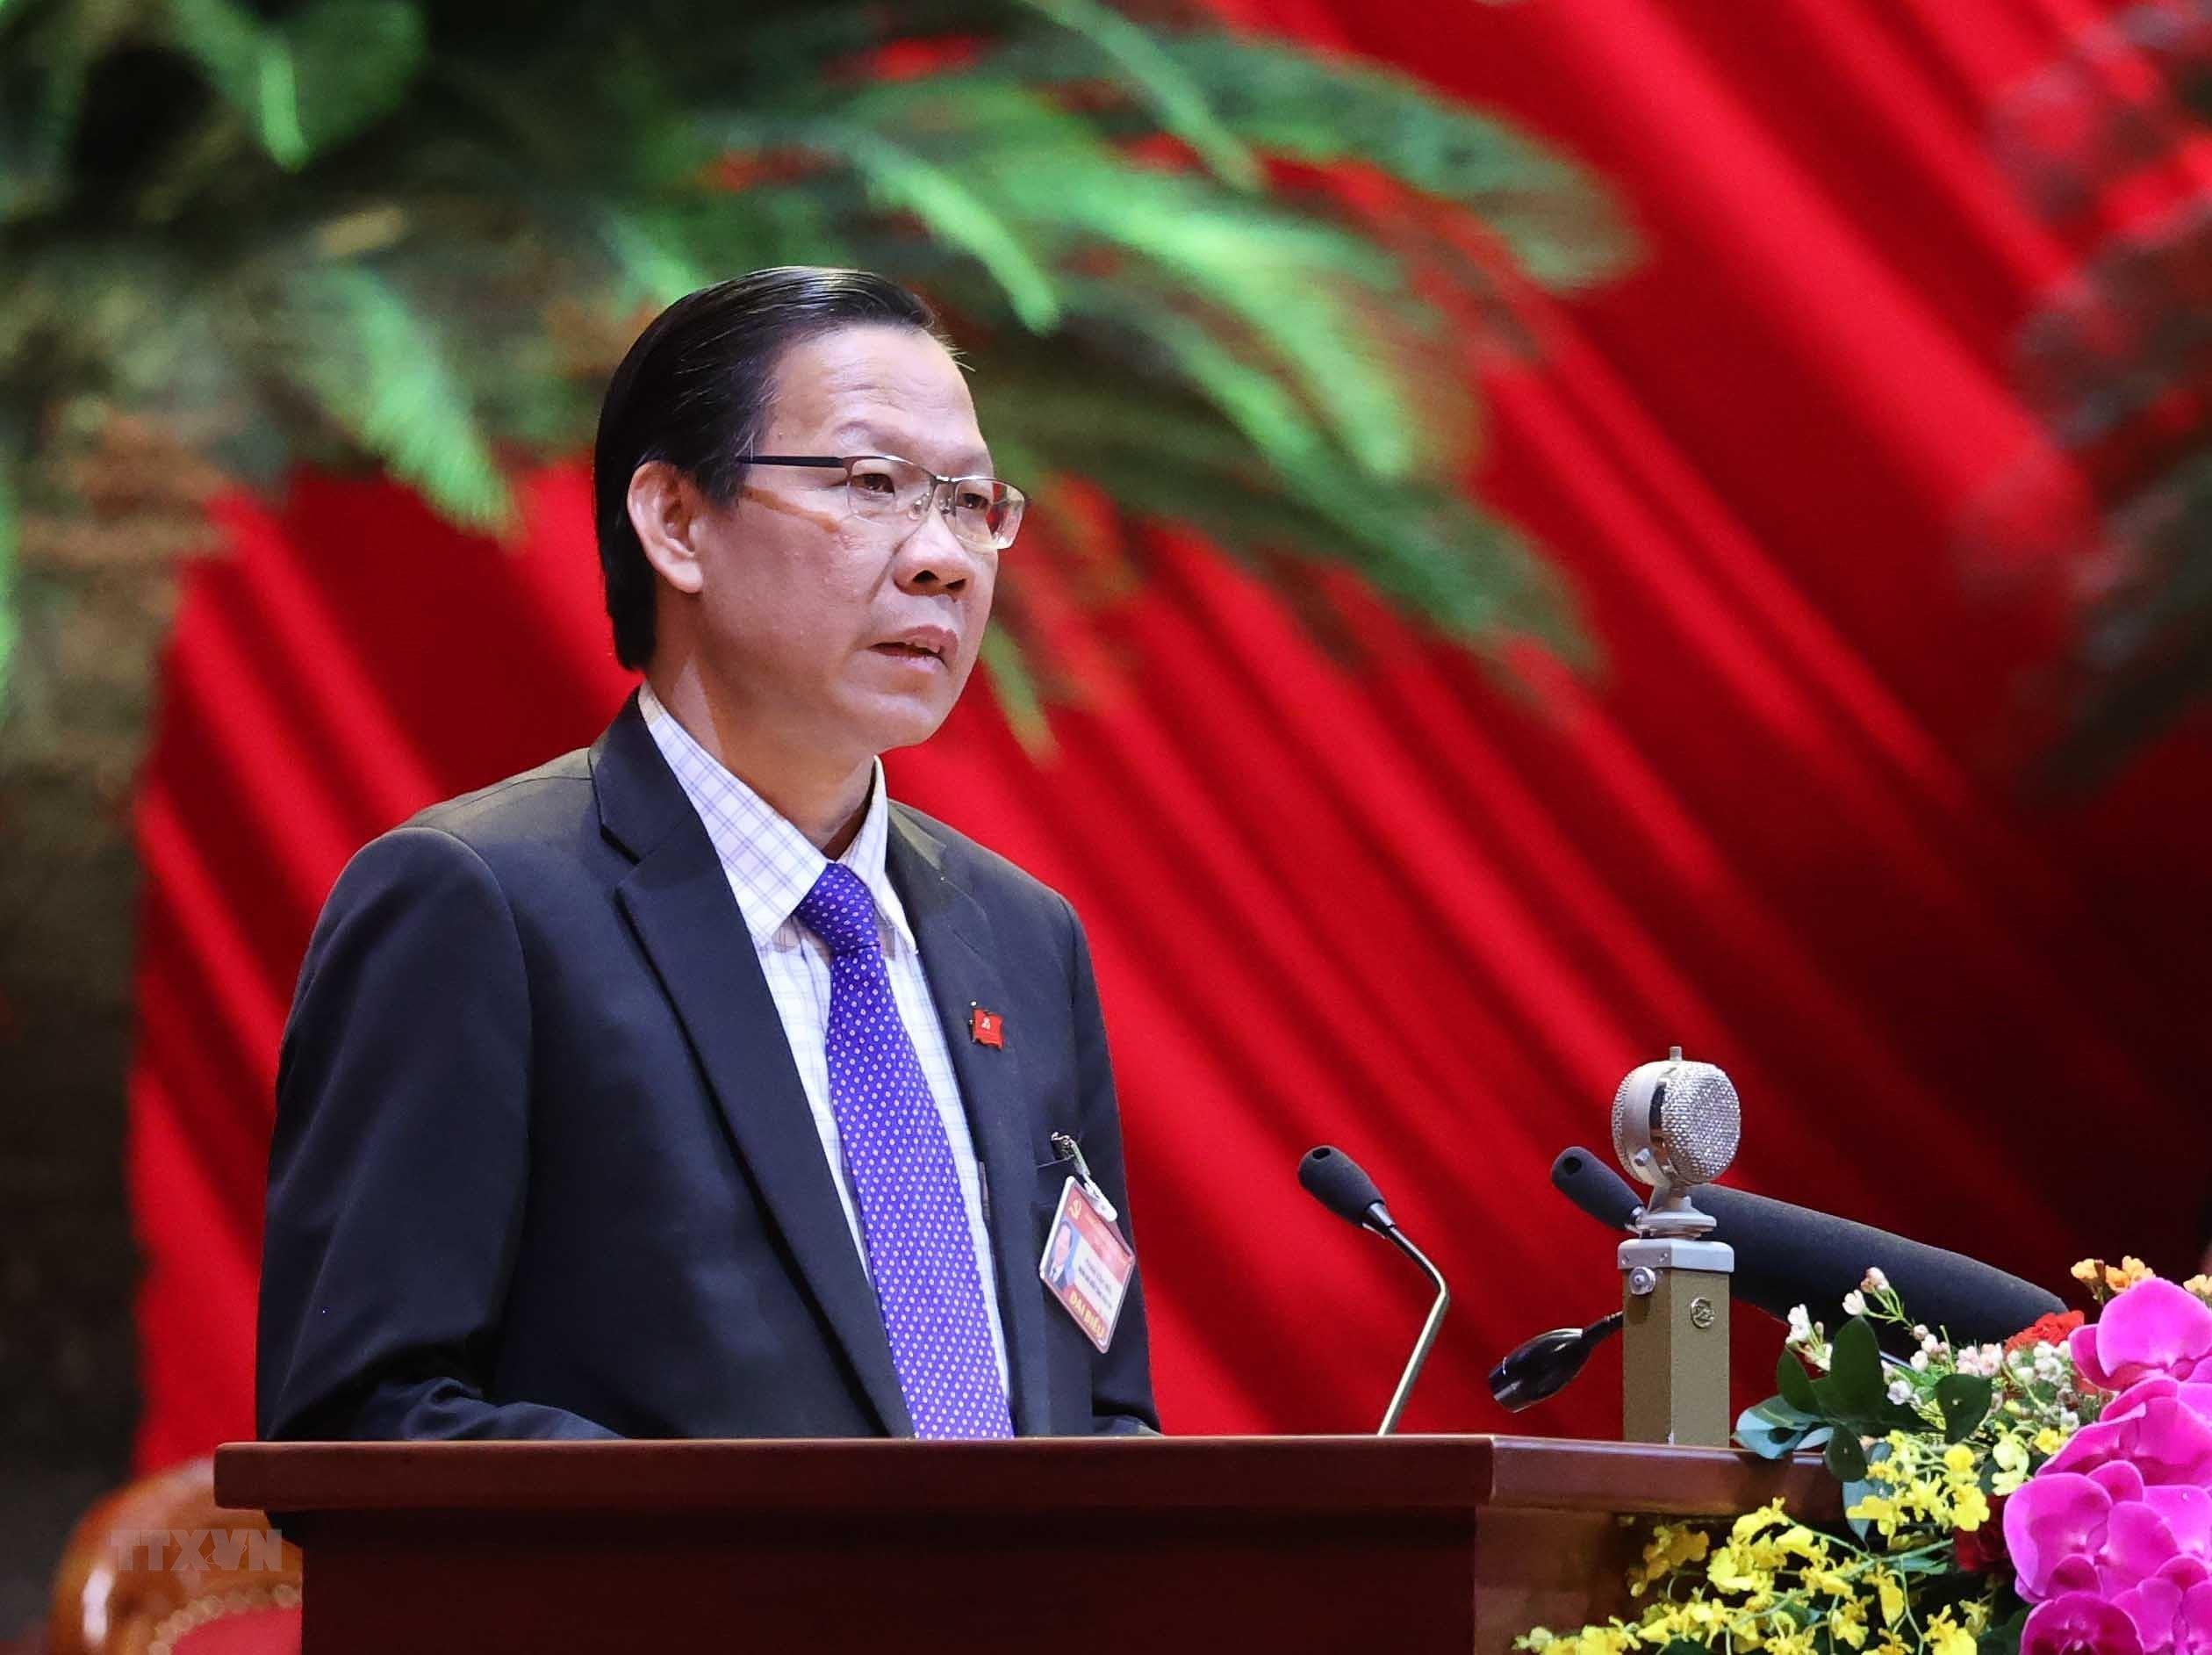 [Photo] Quang canh phien thao luan cac van kien Dai hoi XIII cua Dang hinh anh 32